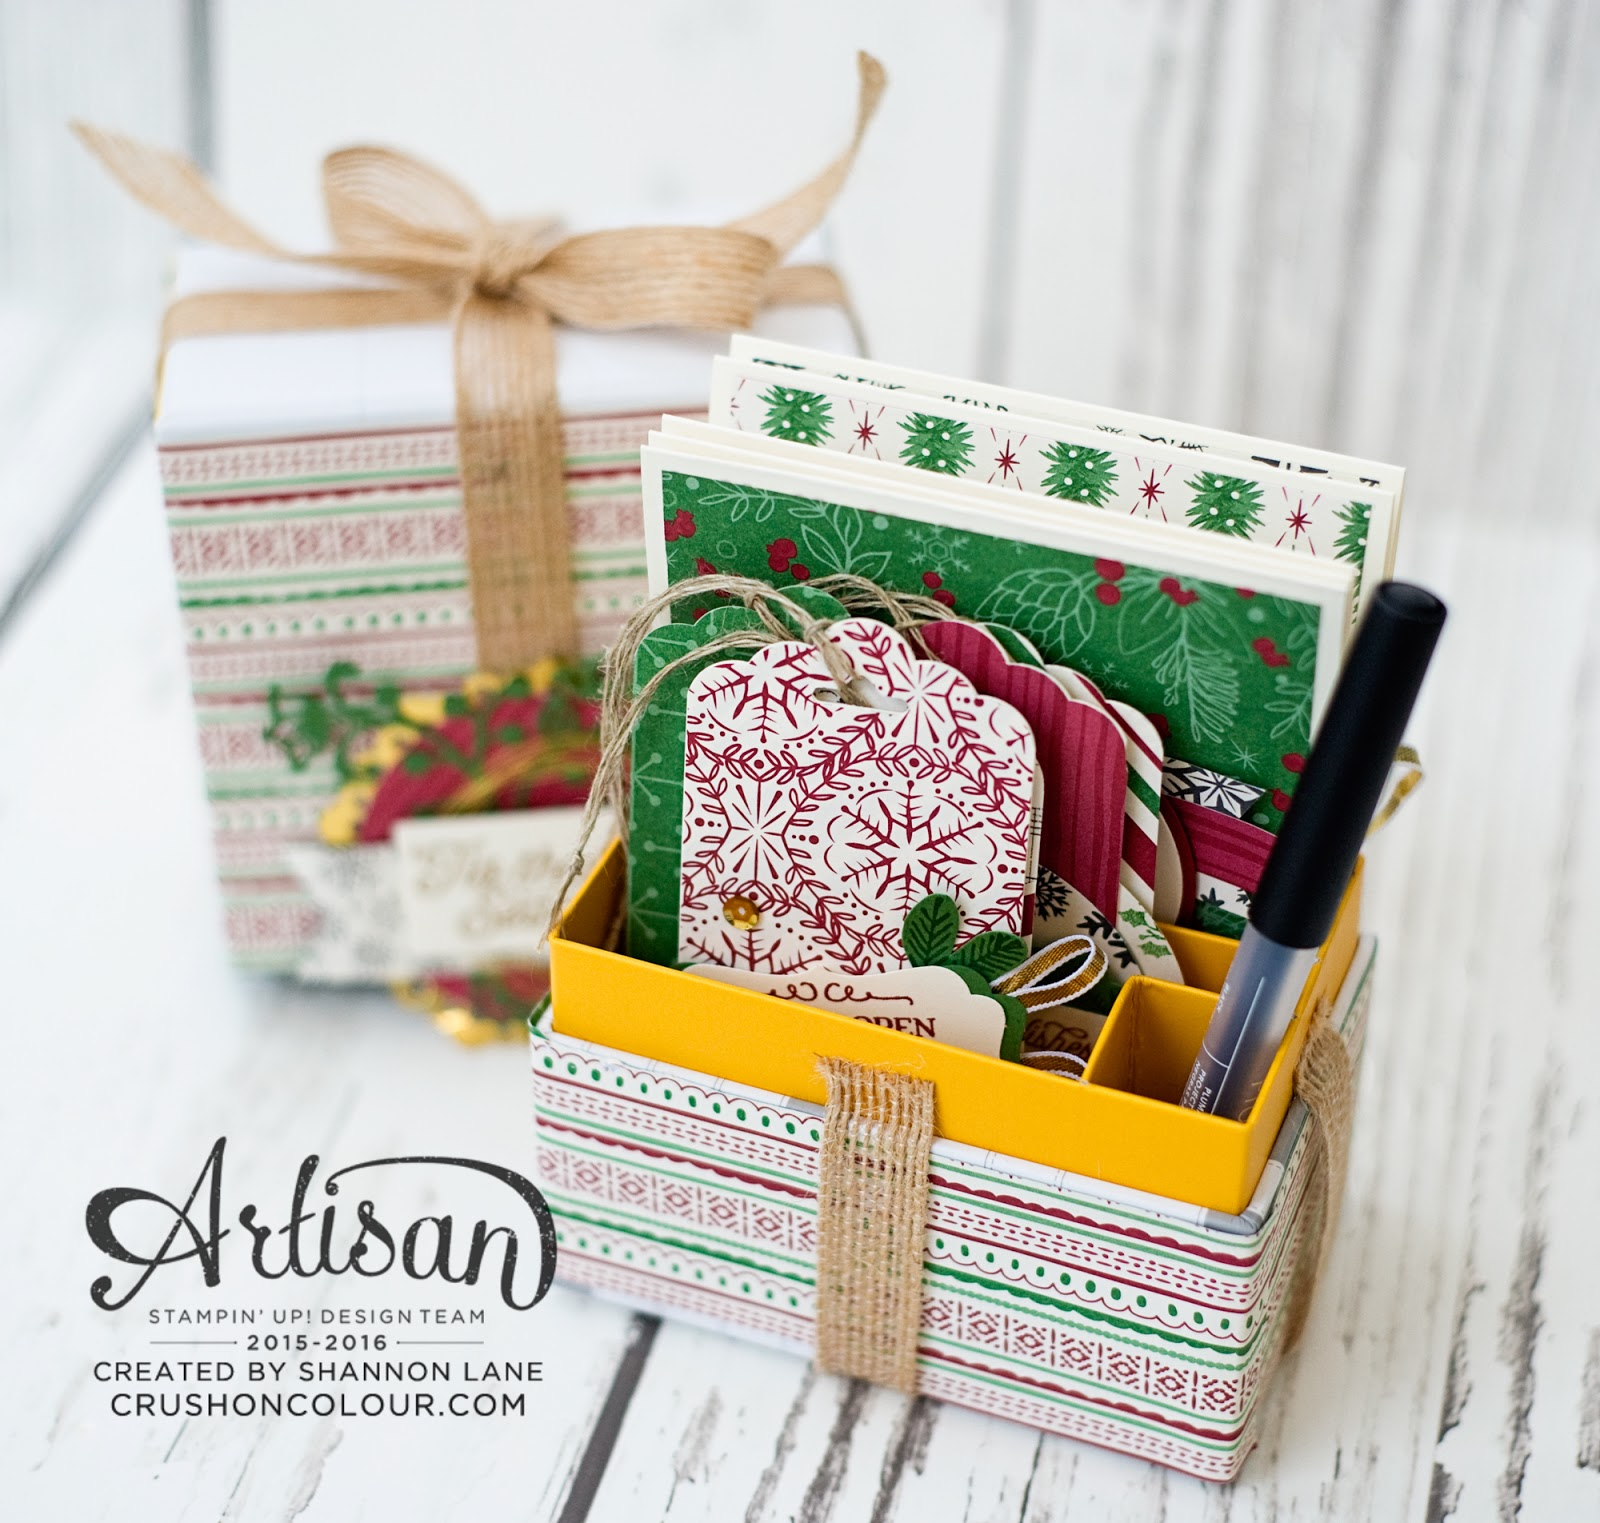 Crush on colour stampin up artisan design team hop